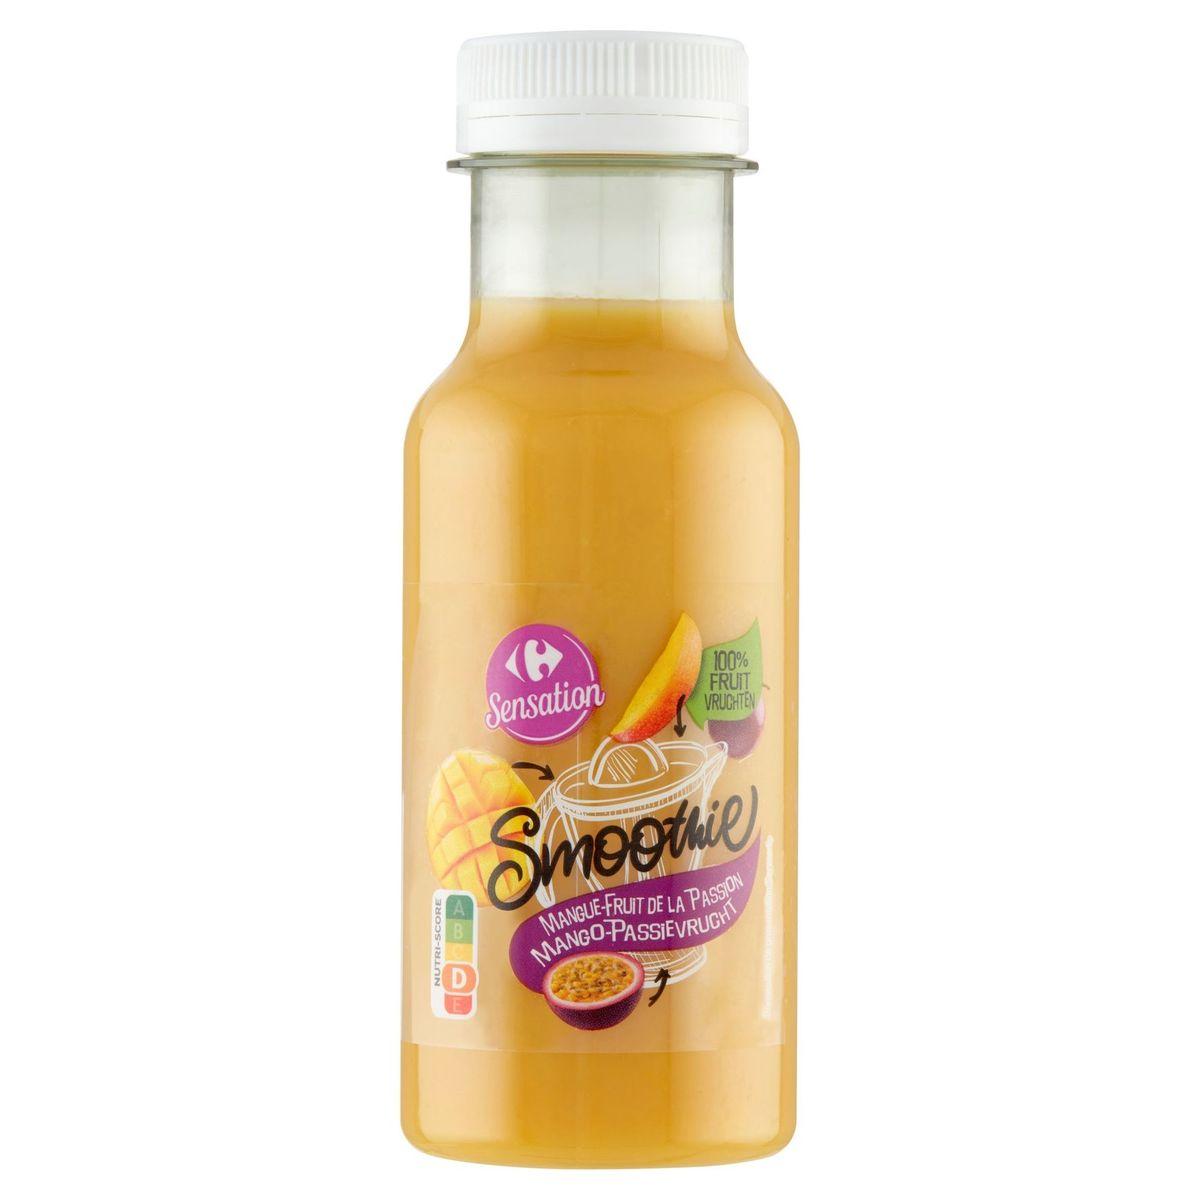 Carrefour Sensation Smoothie Mango-Passievrucht 250 ml